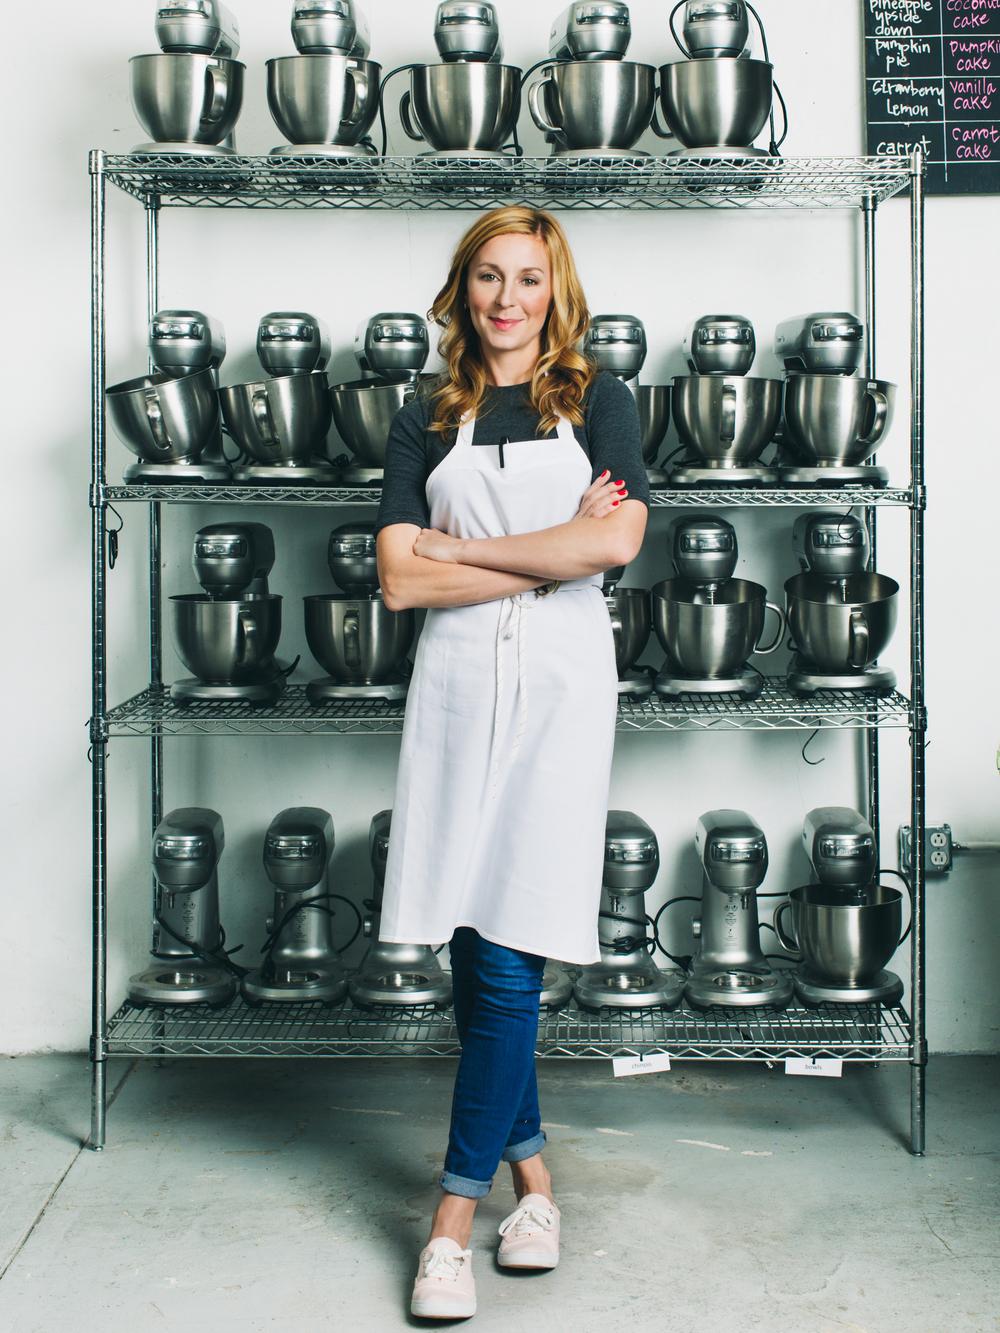 Christina Tosi, Chef and owner of Momofuku Milk Bar